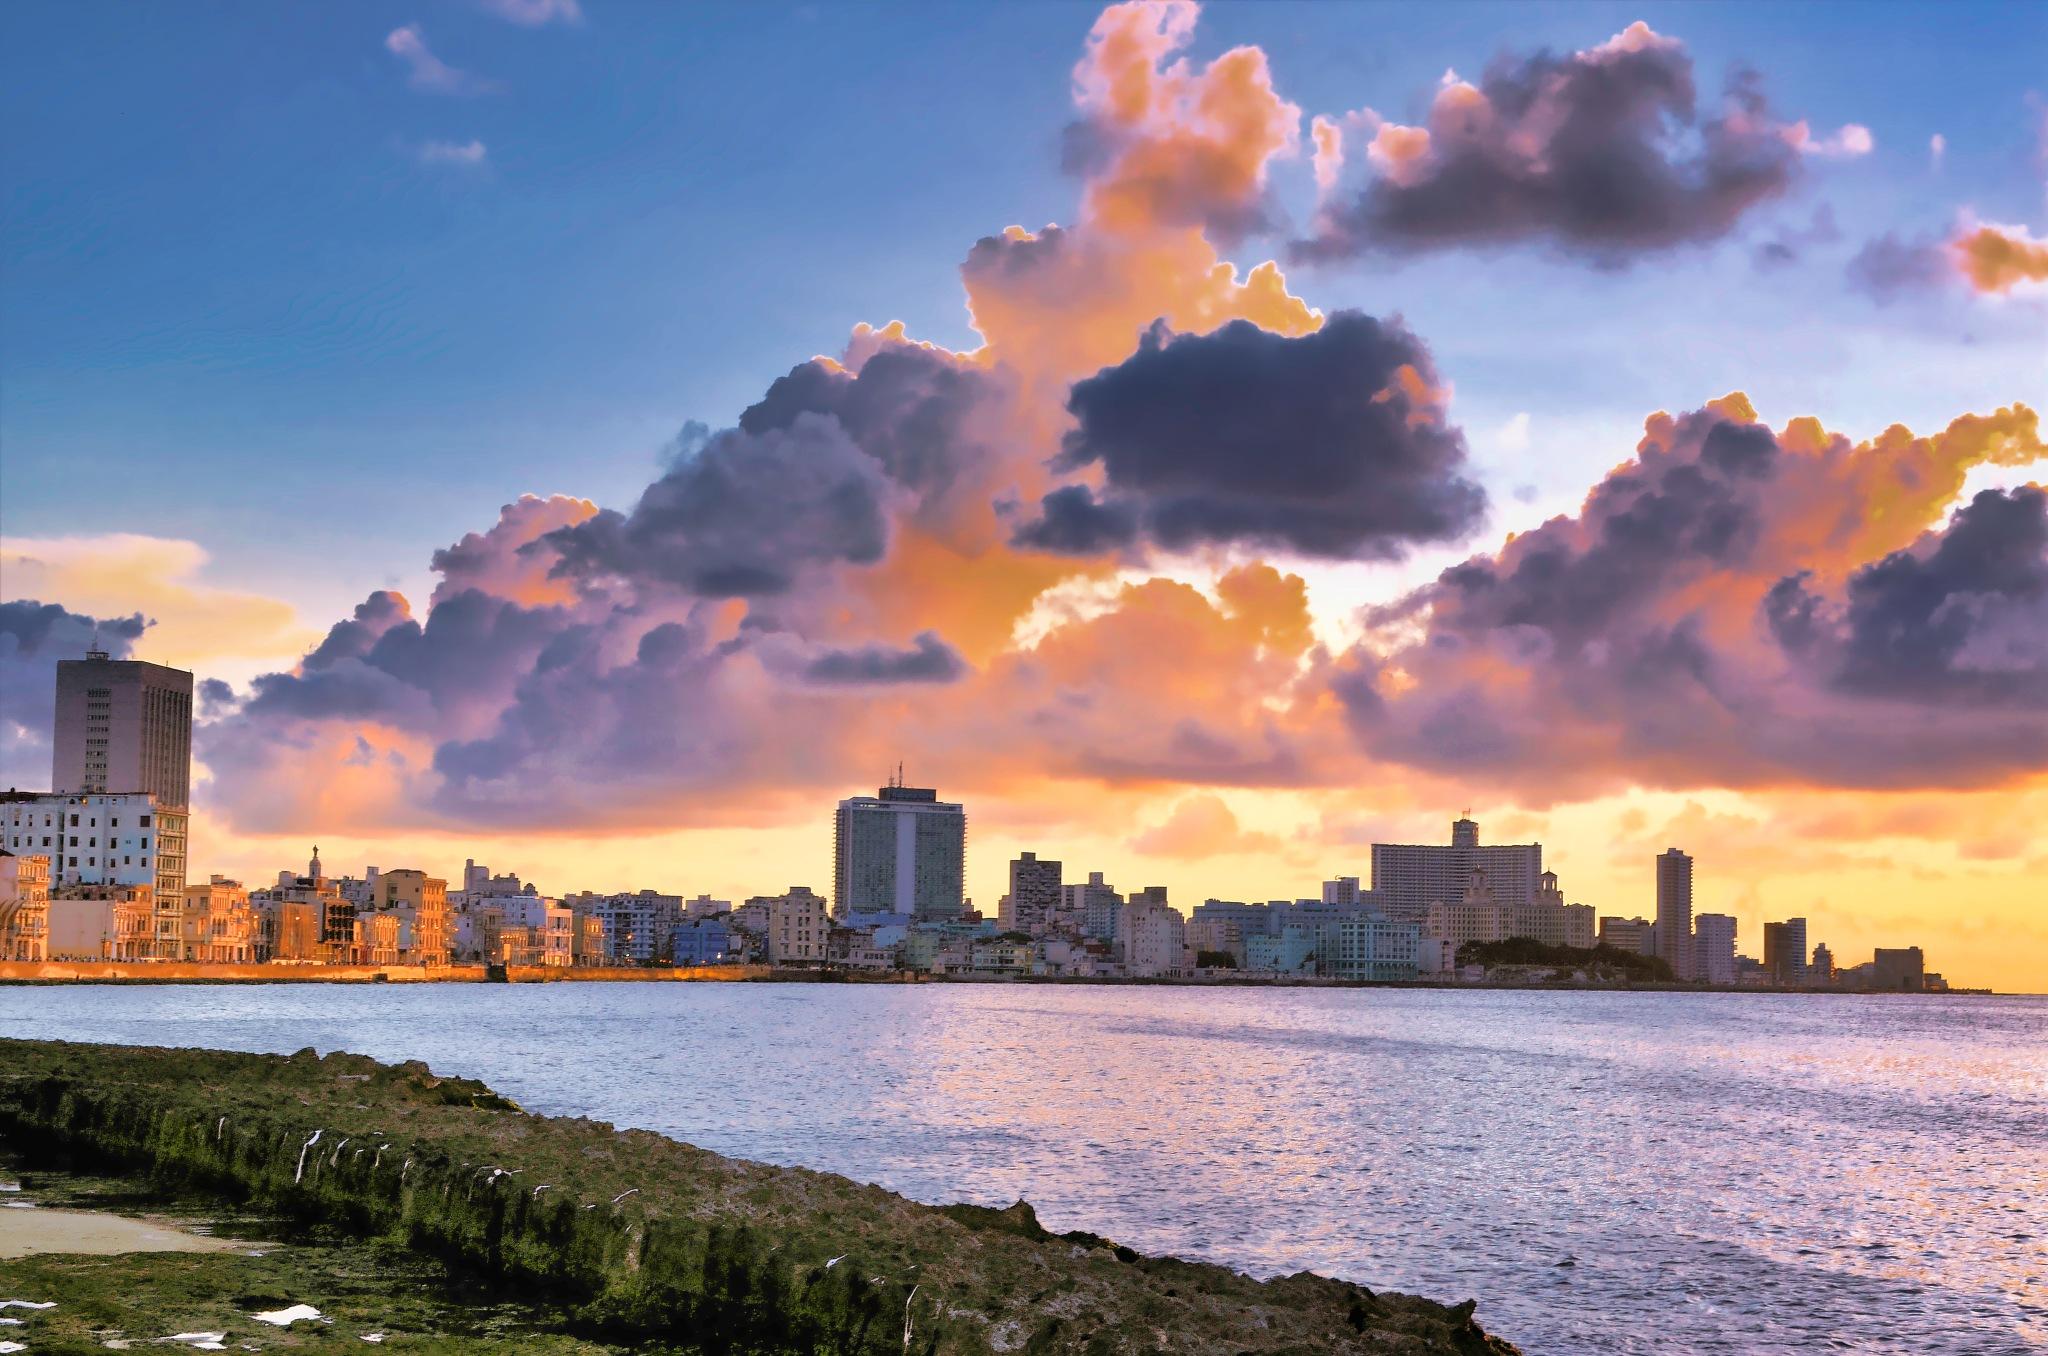 Havana at Sundown by Harrison Hanville